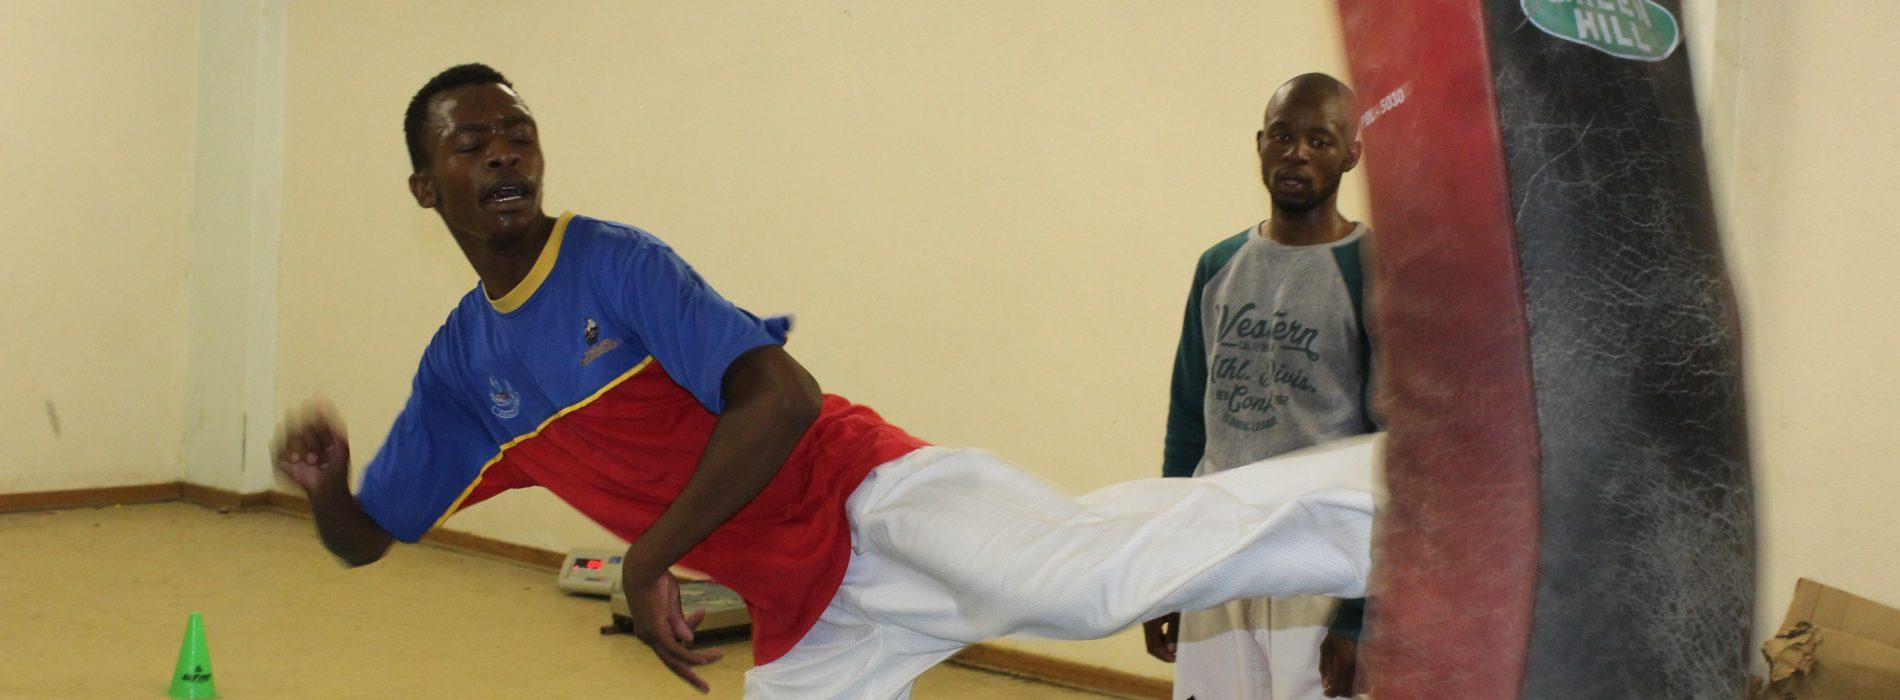 Taekwondo duo in South Korea